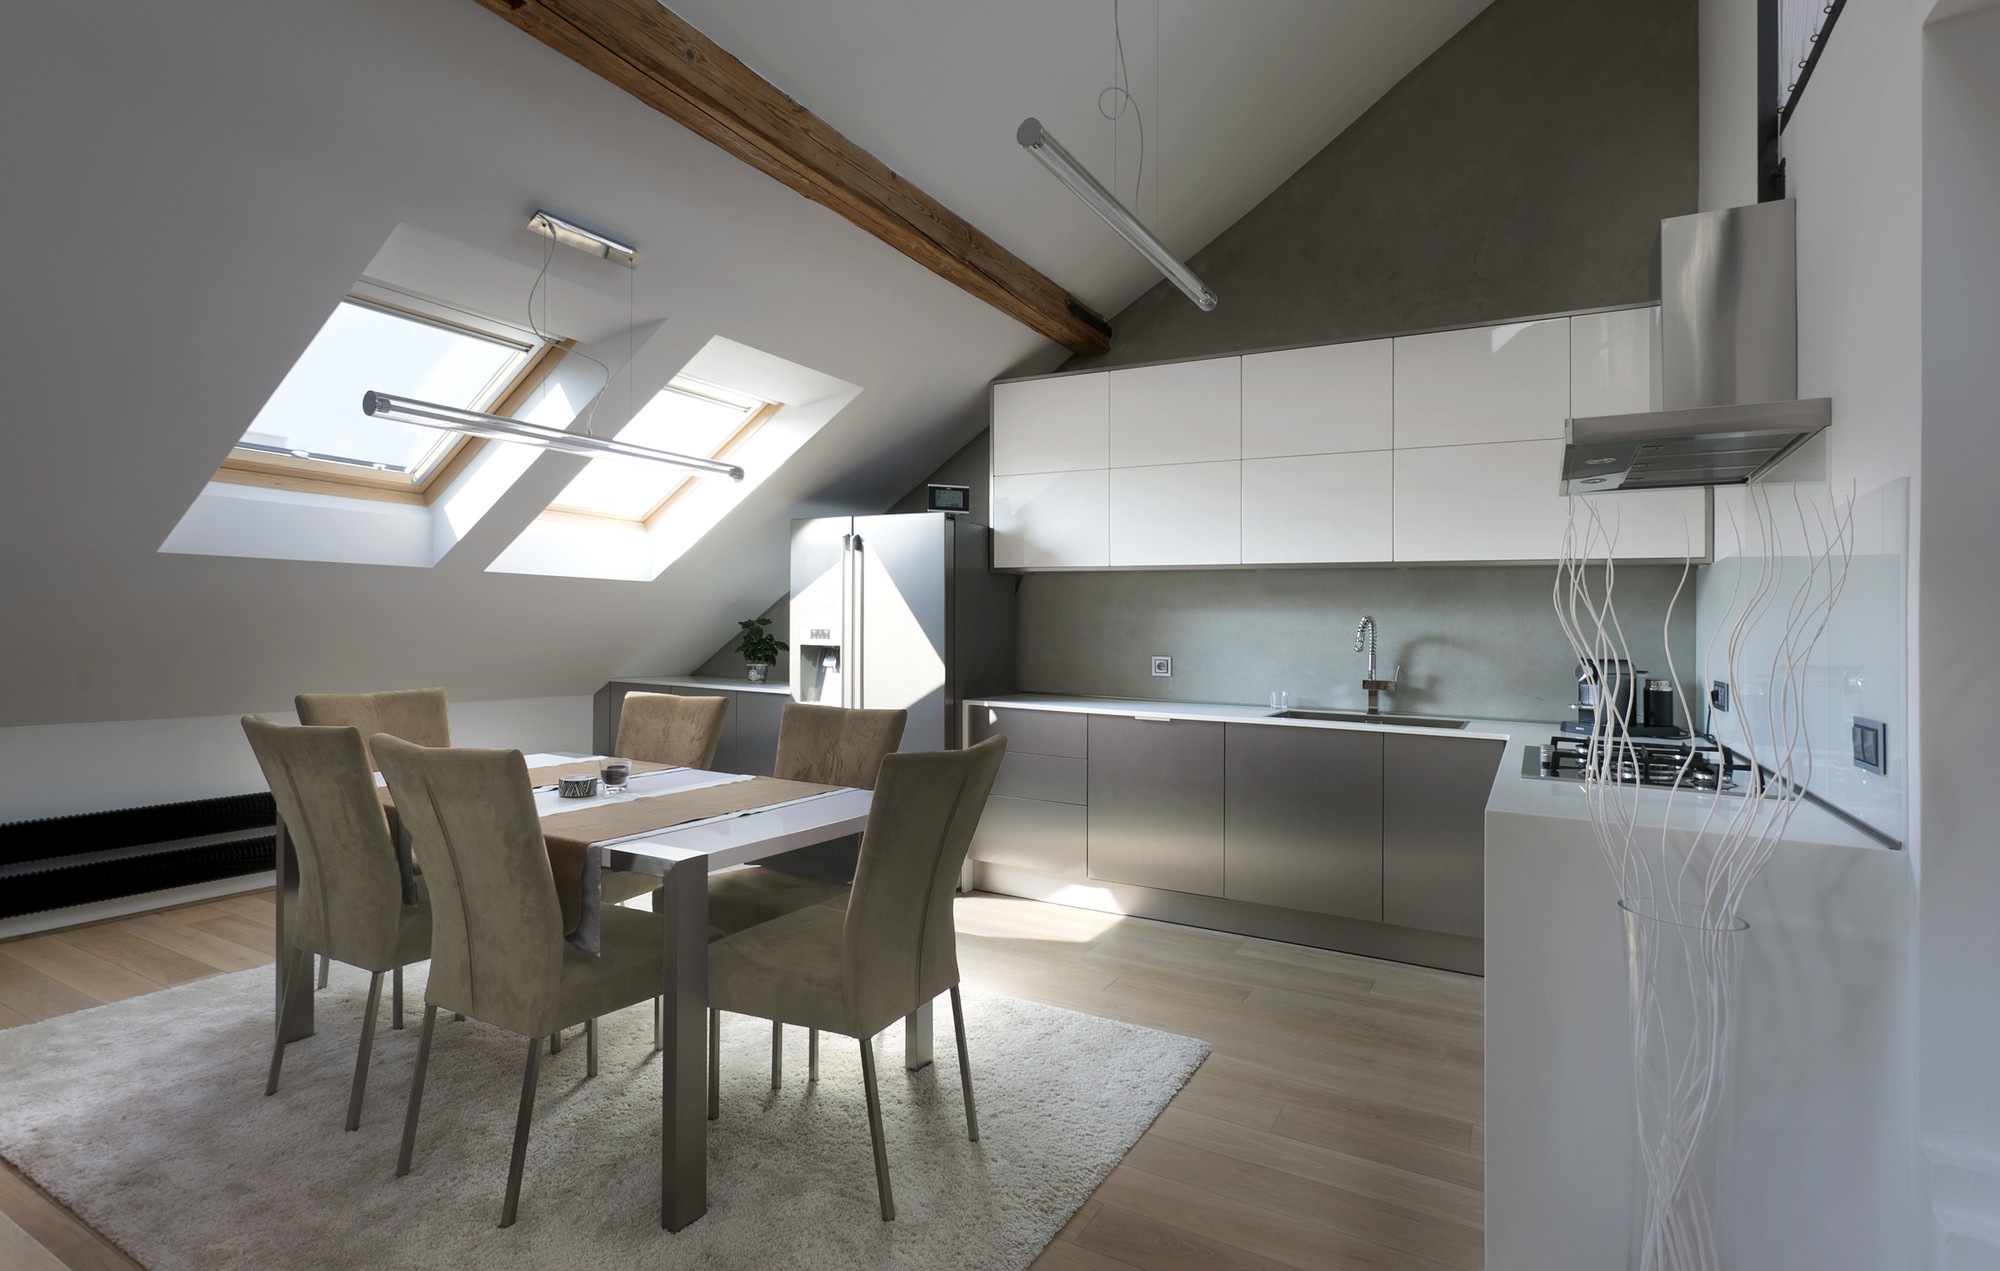 Attic_Loft_Reconstruction_-_2_-kitchen